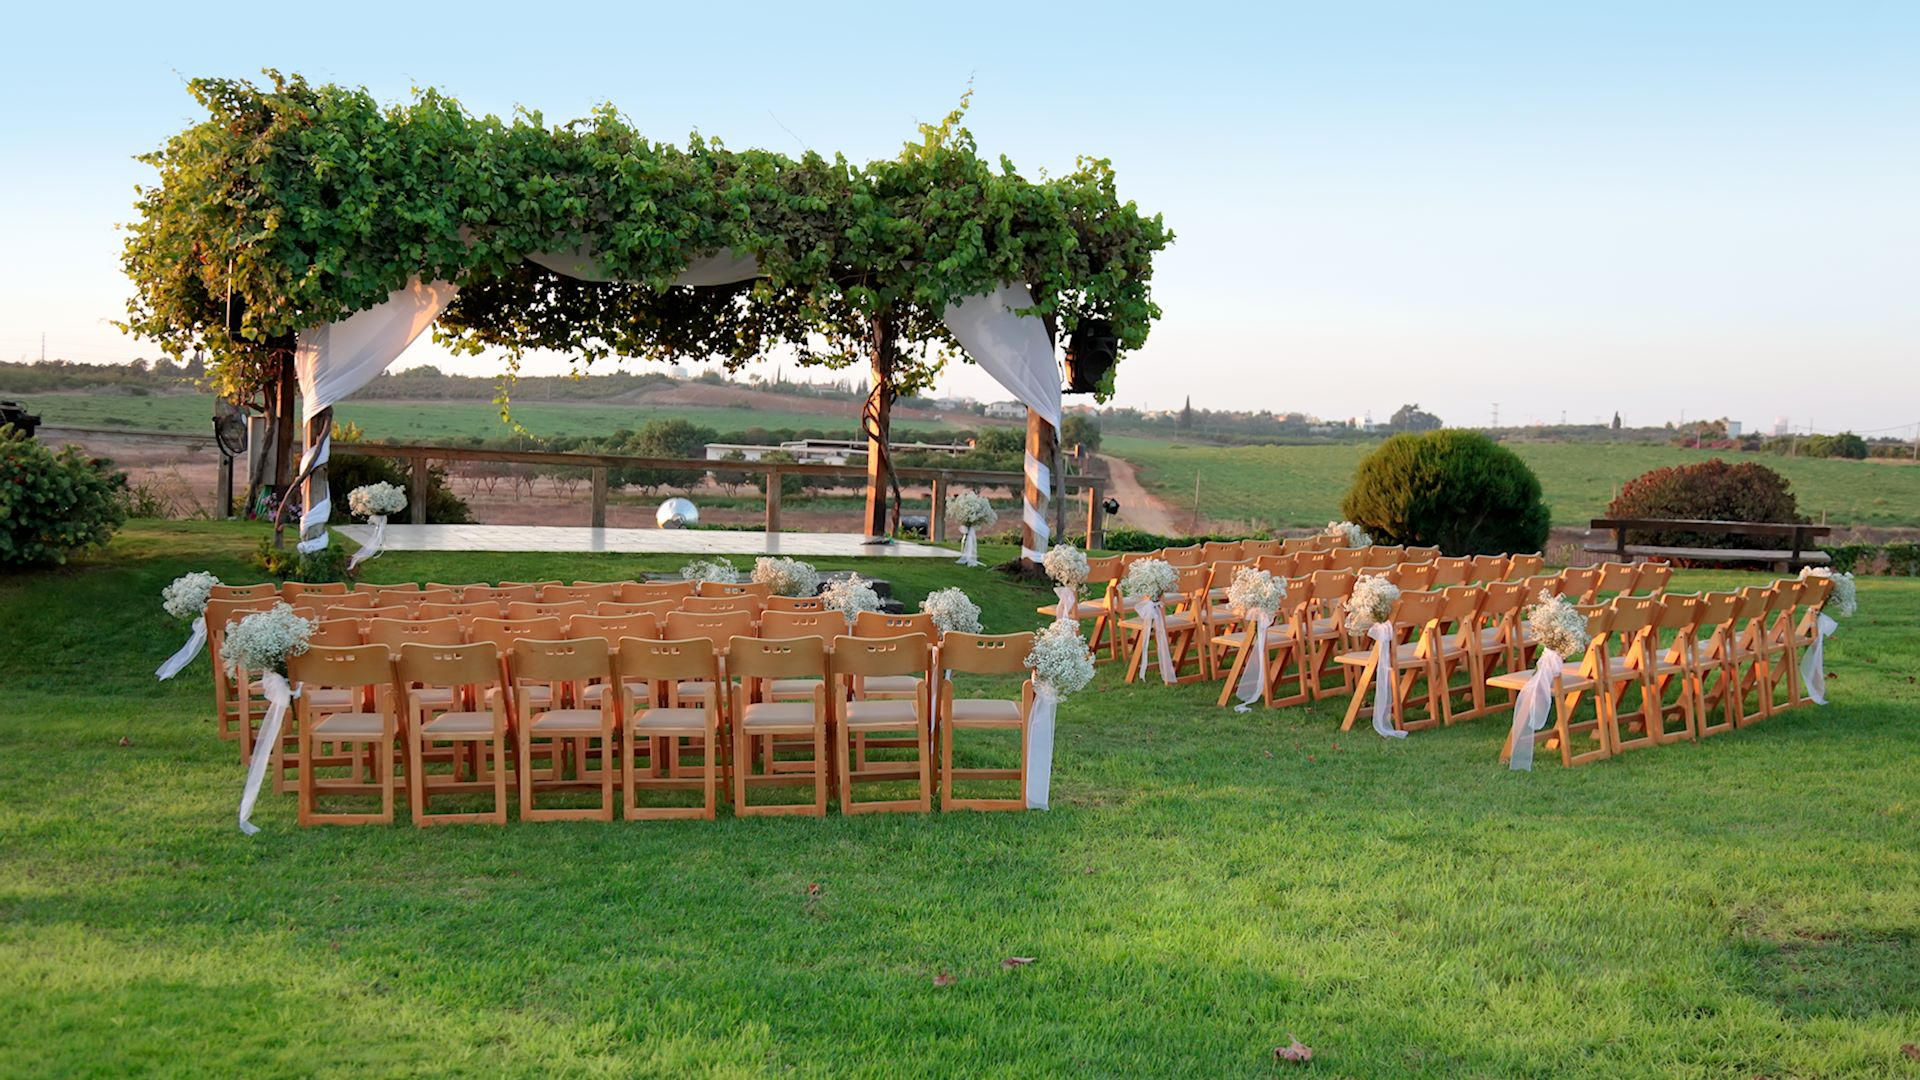 15 rustic wedding centerpiece ideas. 10 Cheap Outdoor Wedding Decoration Ideas on a Budget in 2021